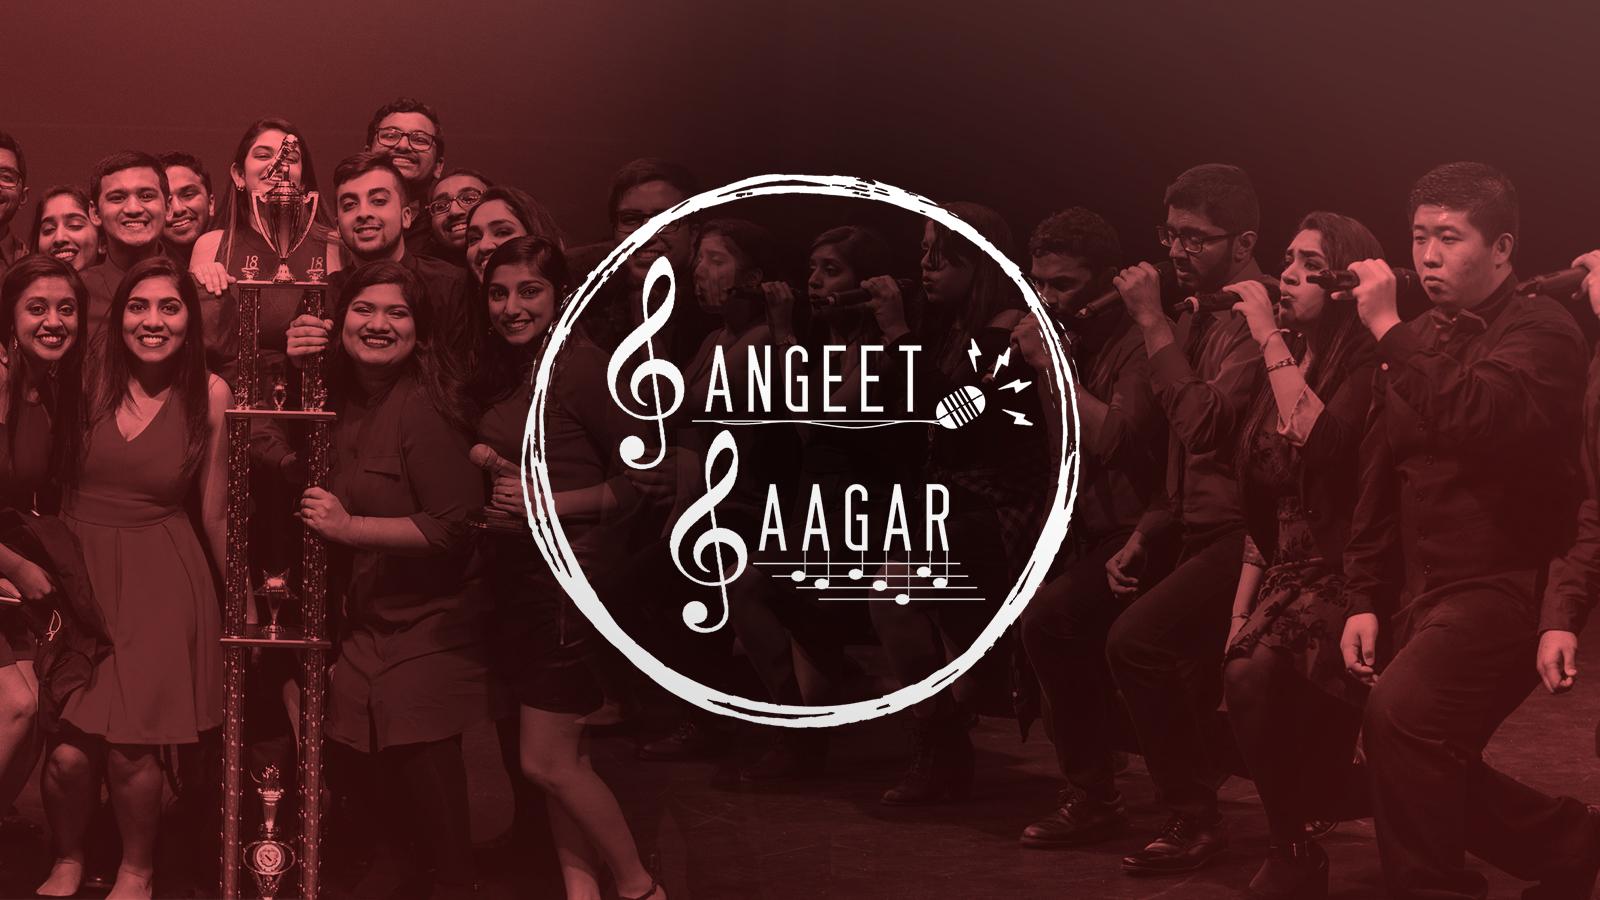 Sangeet Saagar